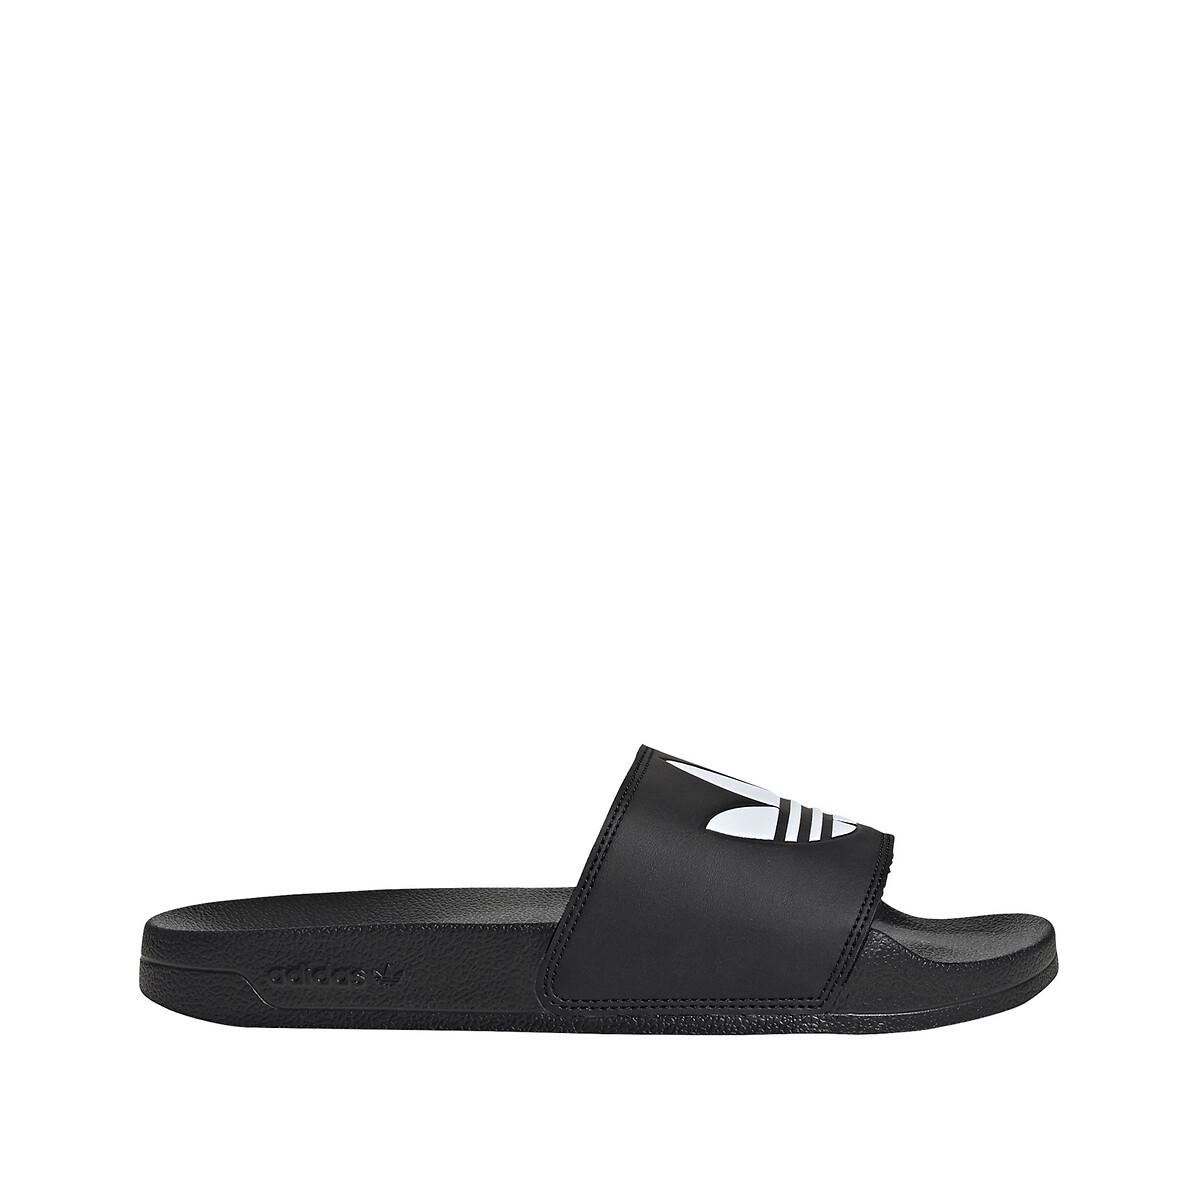 Adidas Originals Adilette Lite badslippers zwart/wit online kopen